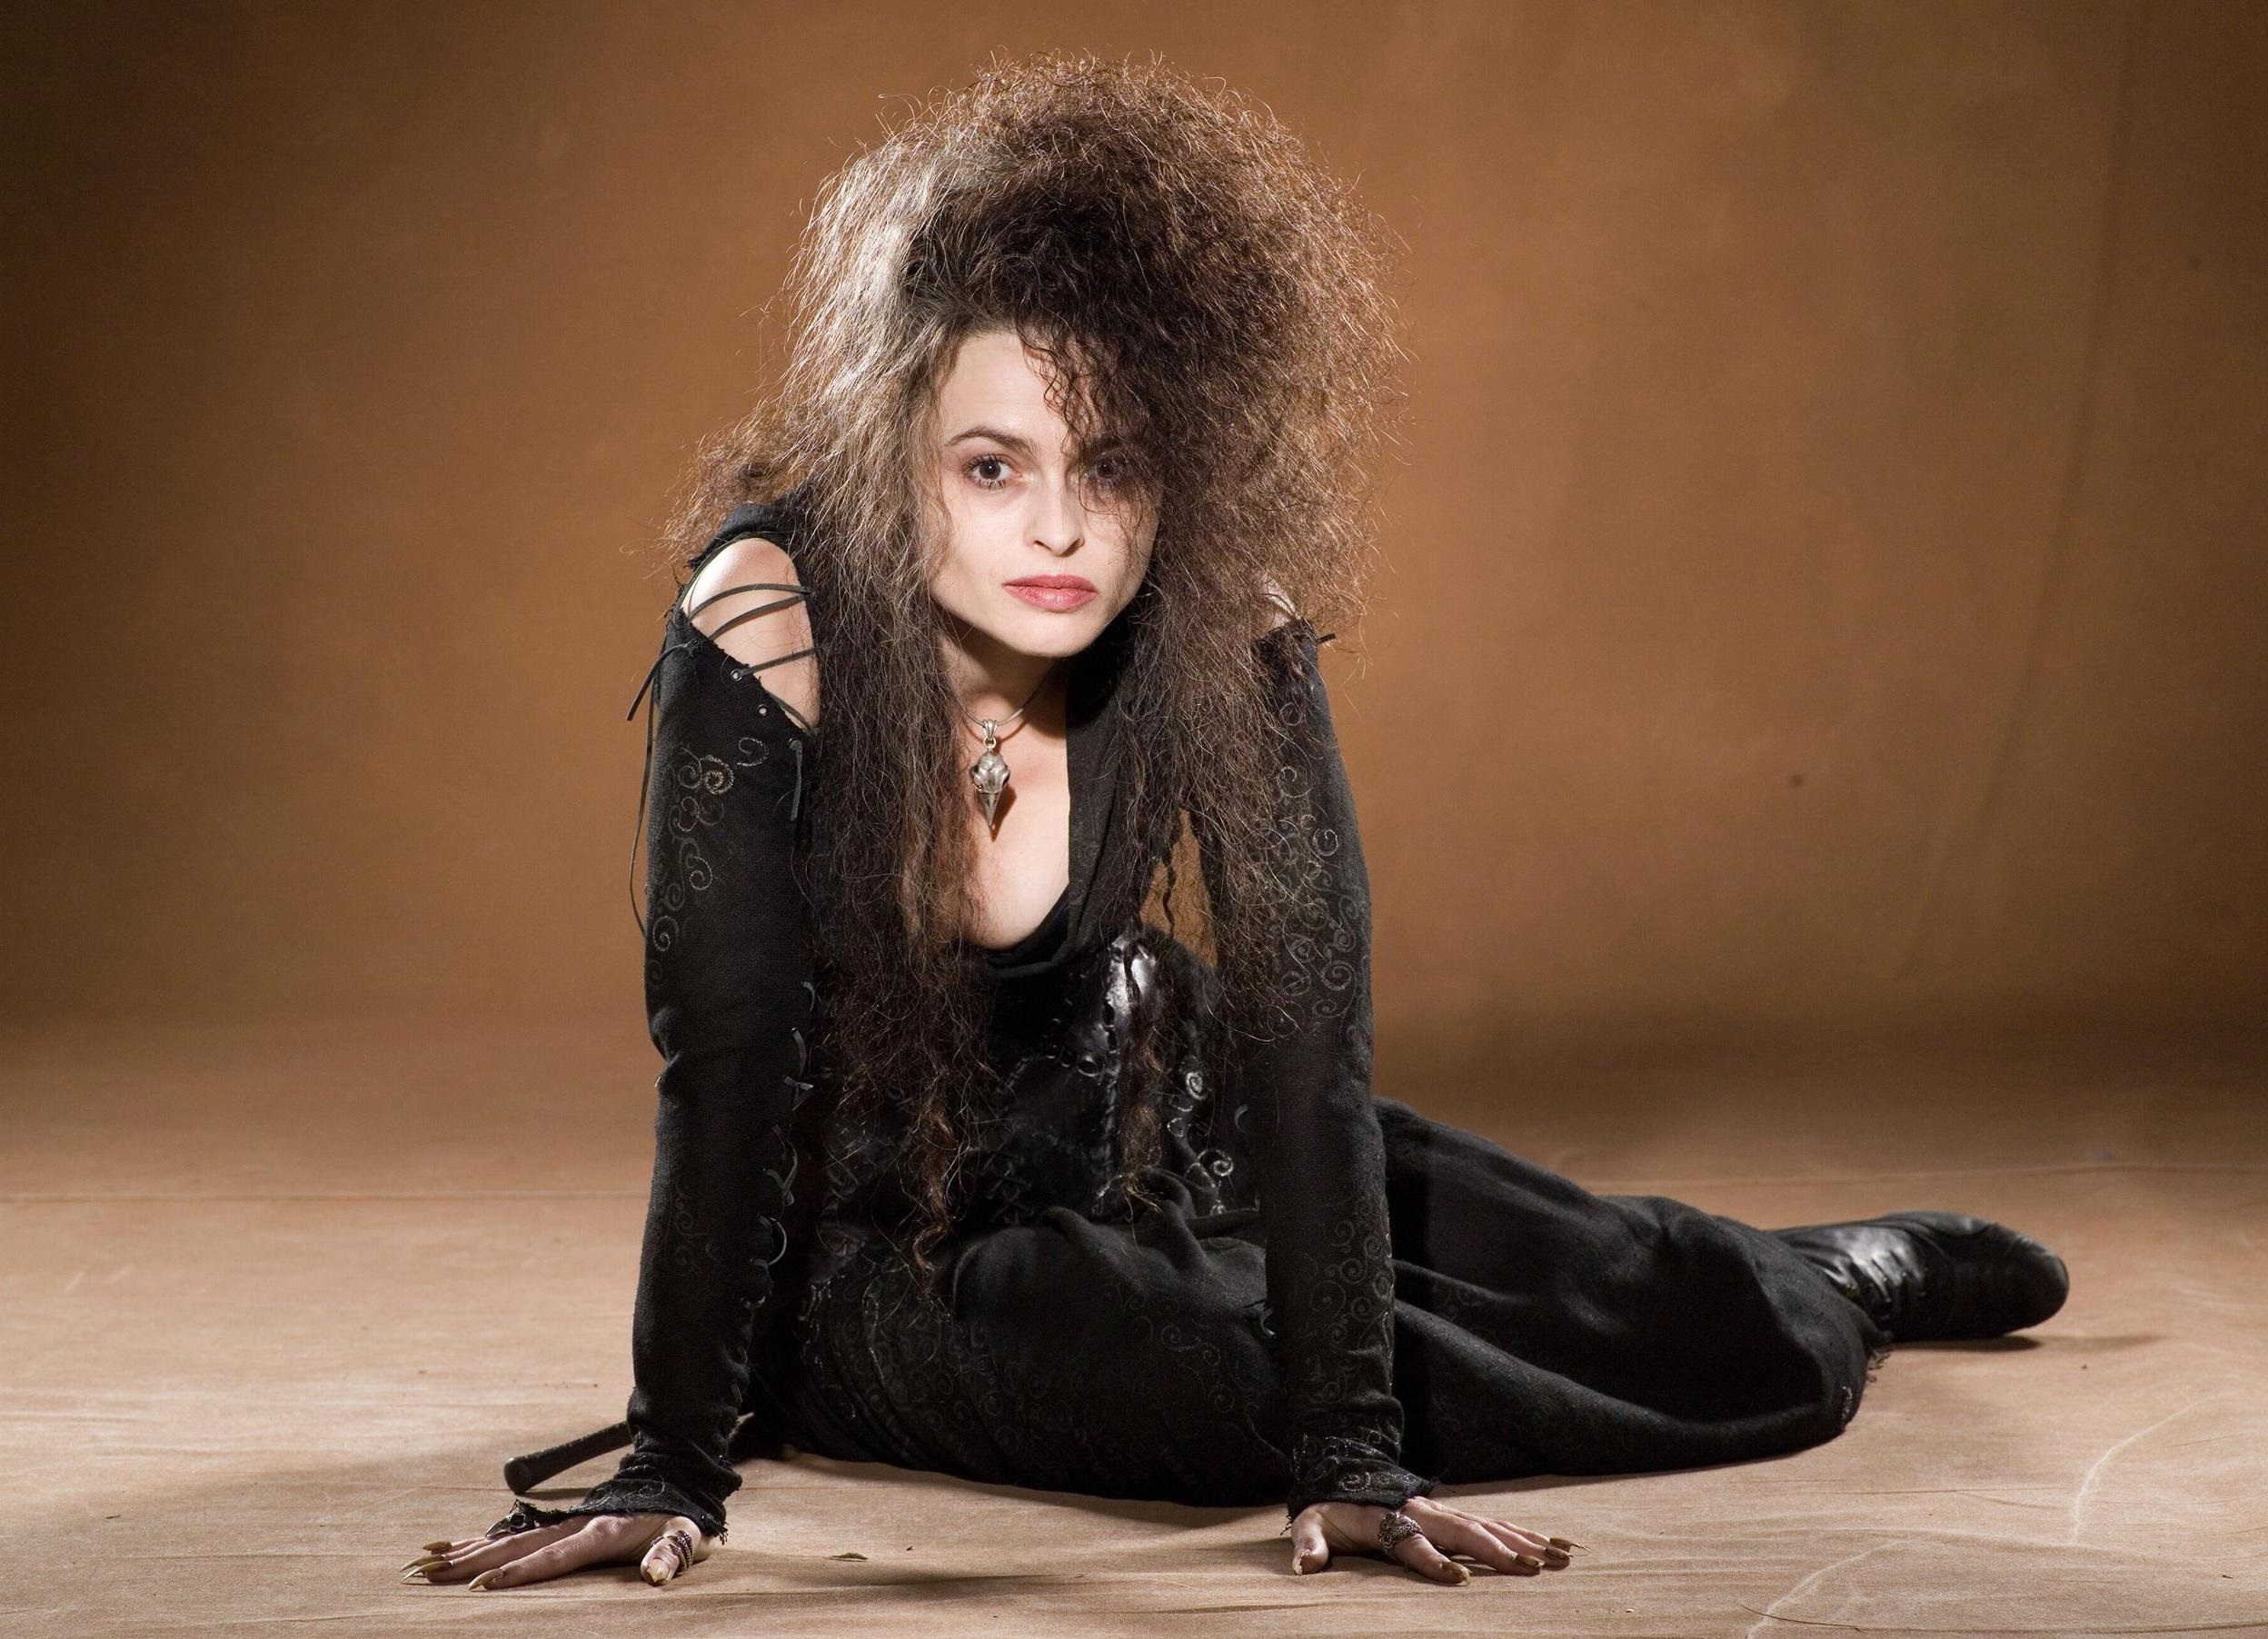 Helena Bonham Carter 4k